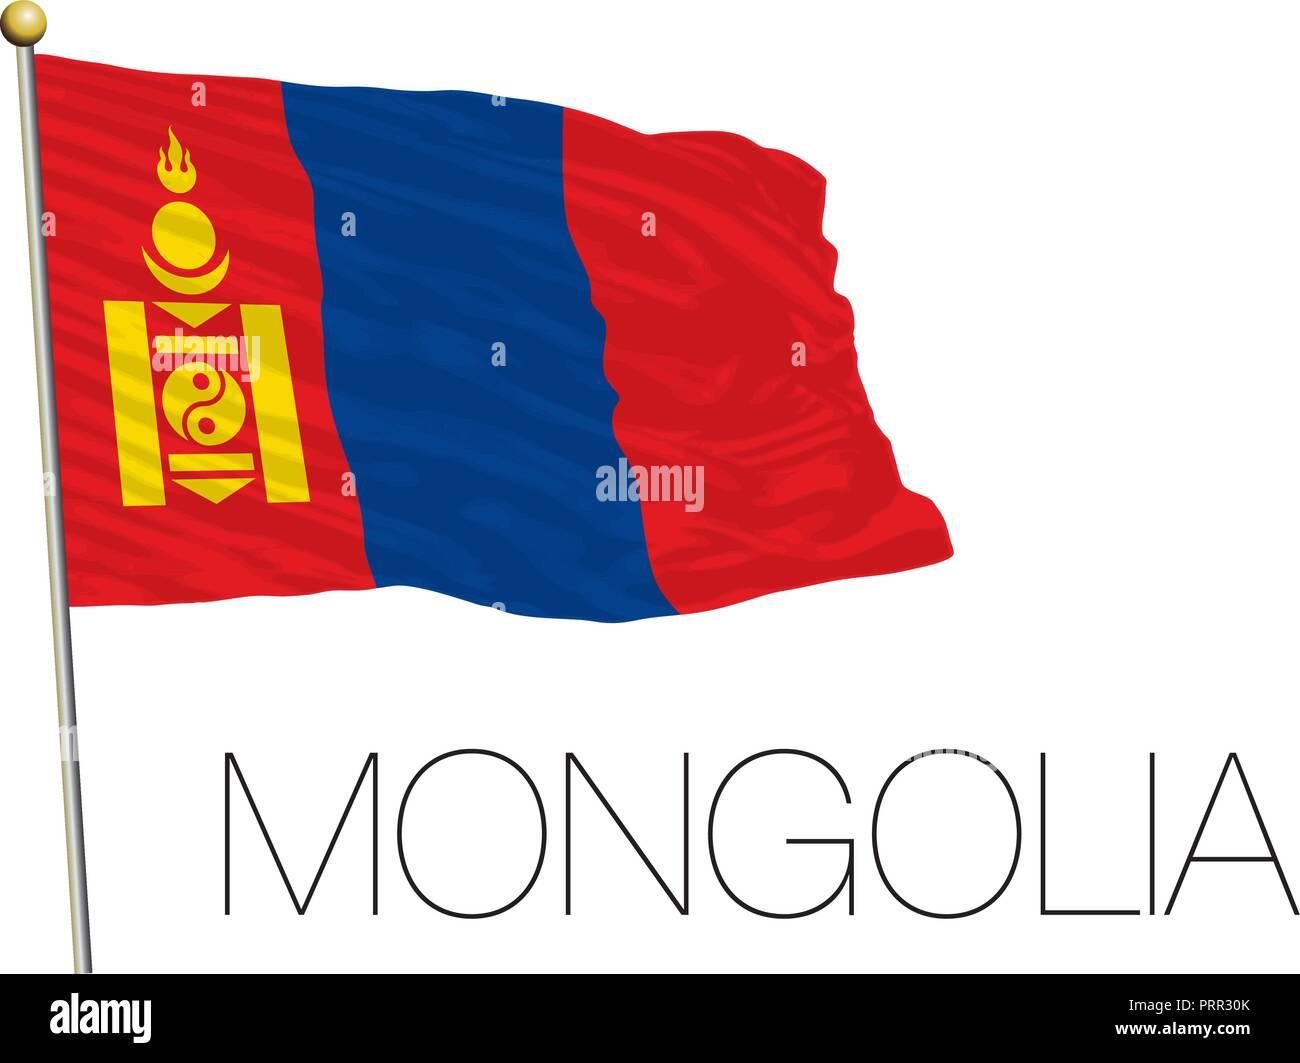 Mongolia official flag, vector illustration - Stock Vector